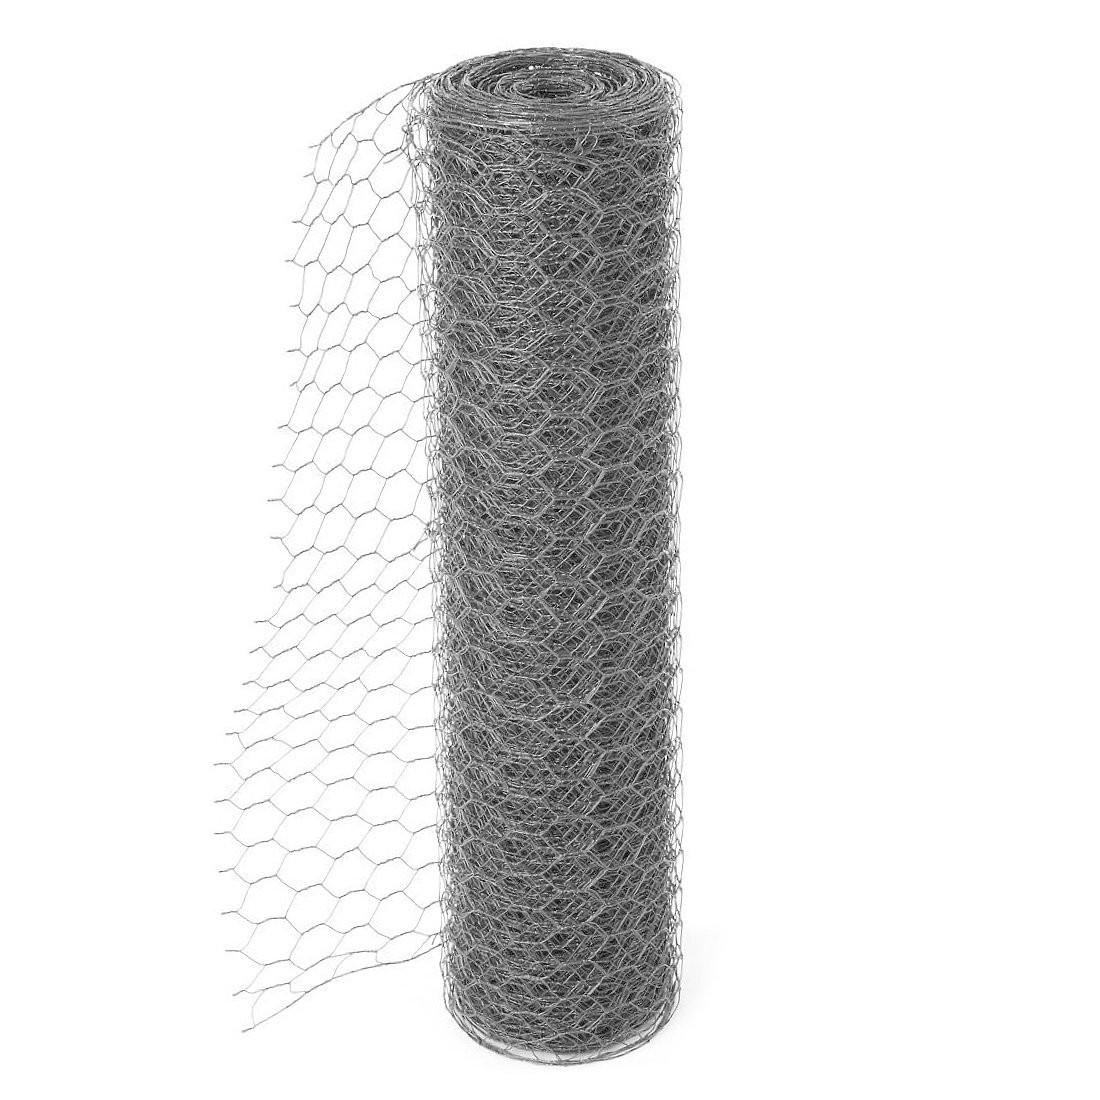 Chicken Wire Netting Galvanised